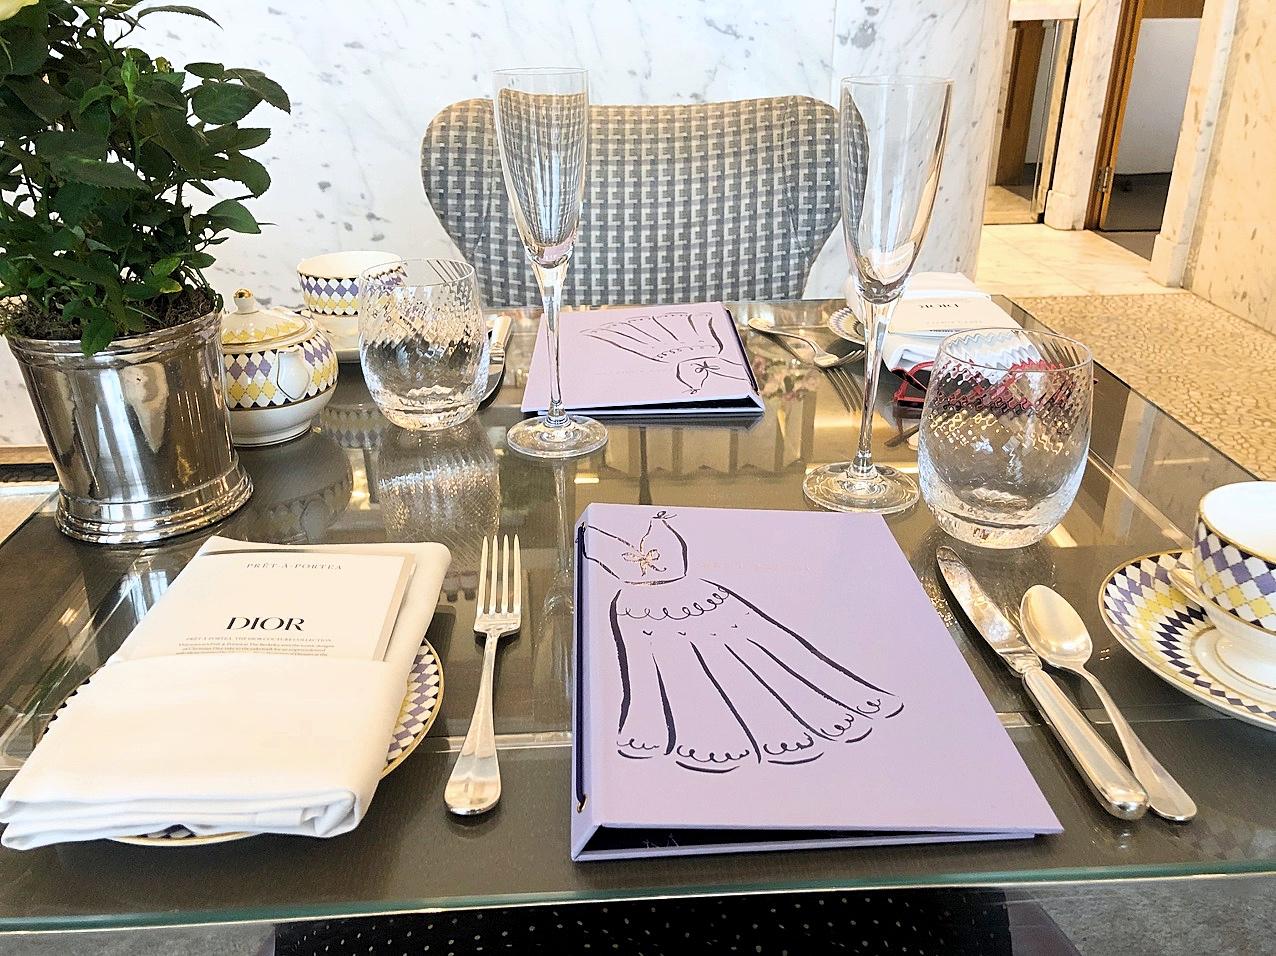 Review: Dior Prêt-à-Portea  at The Berkeley   FOOD   FREYA WILCOX